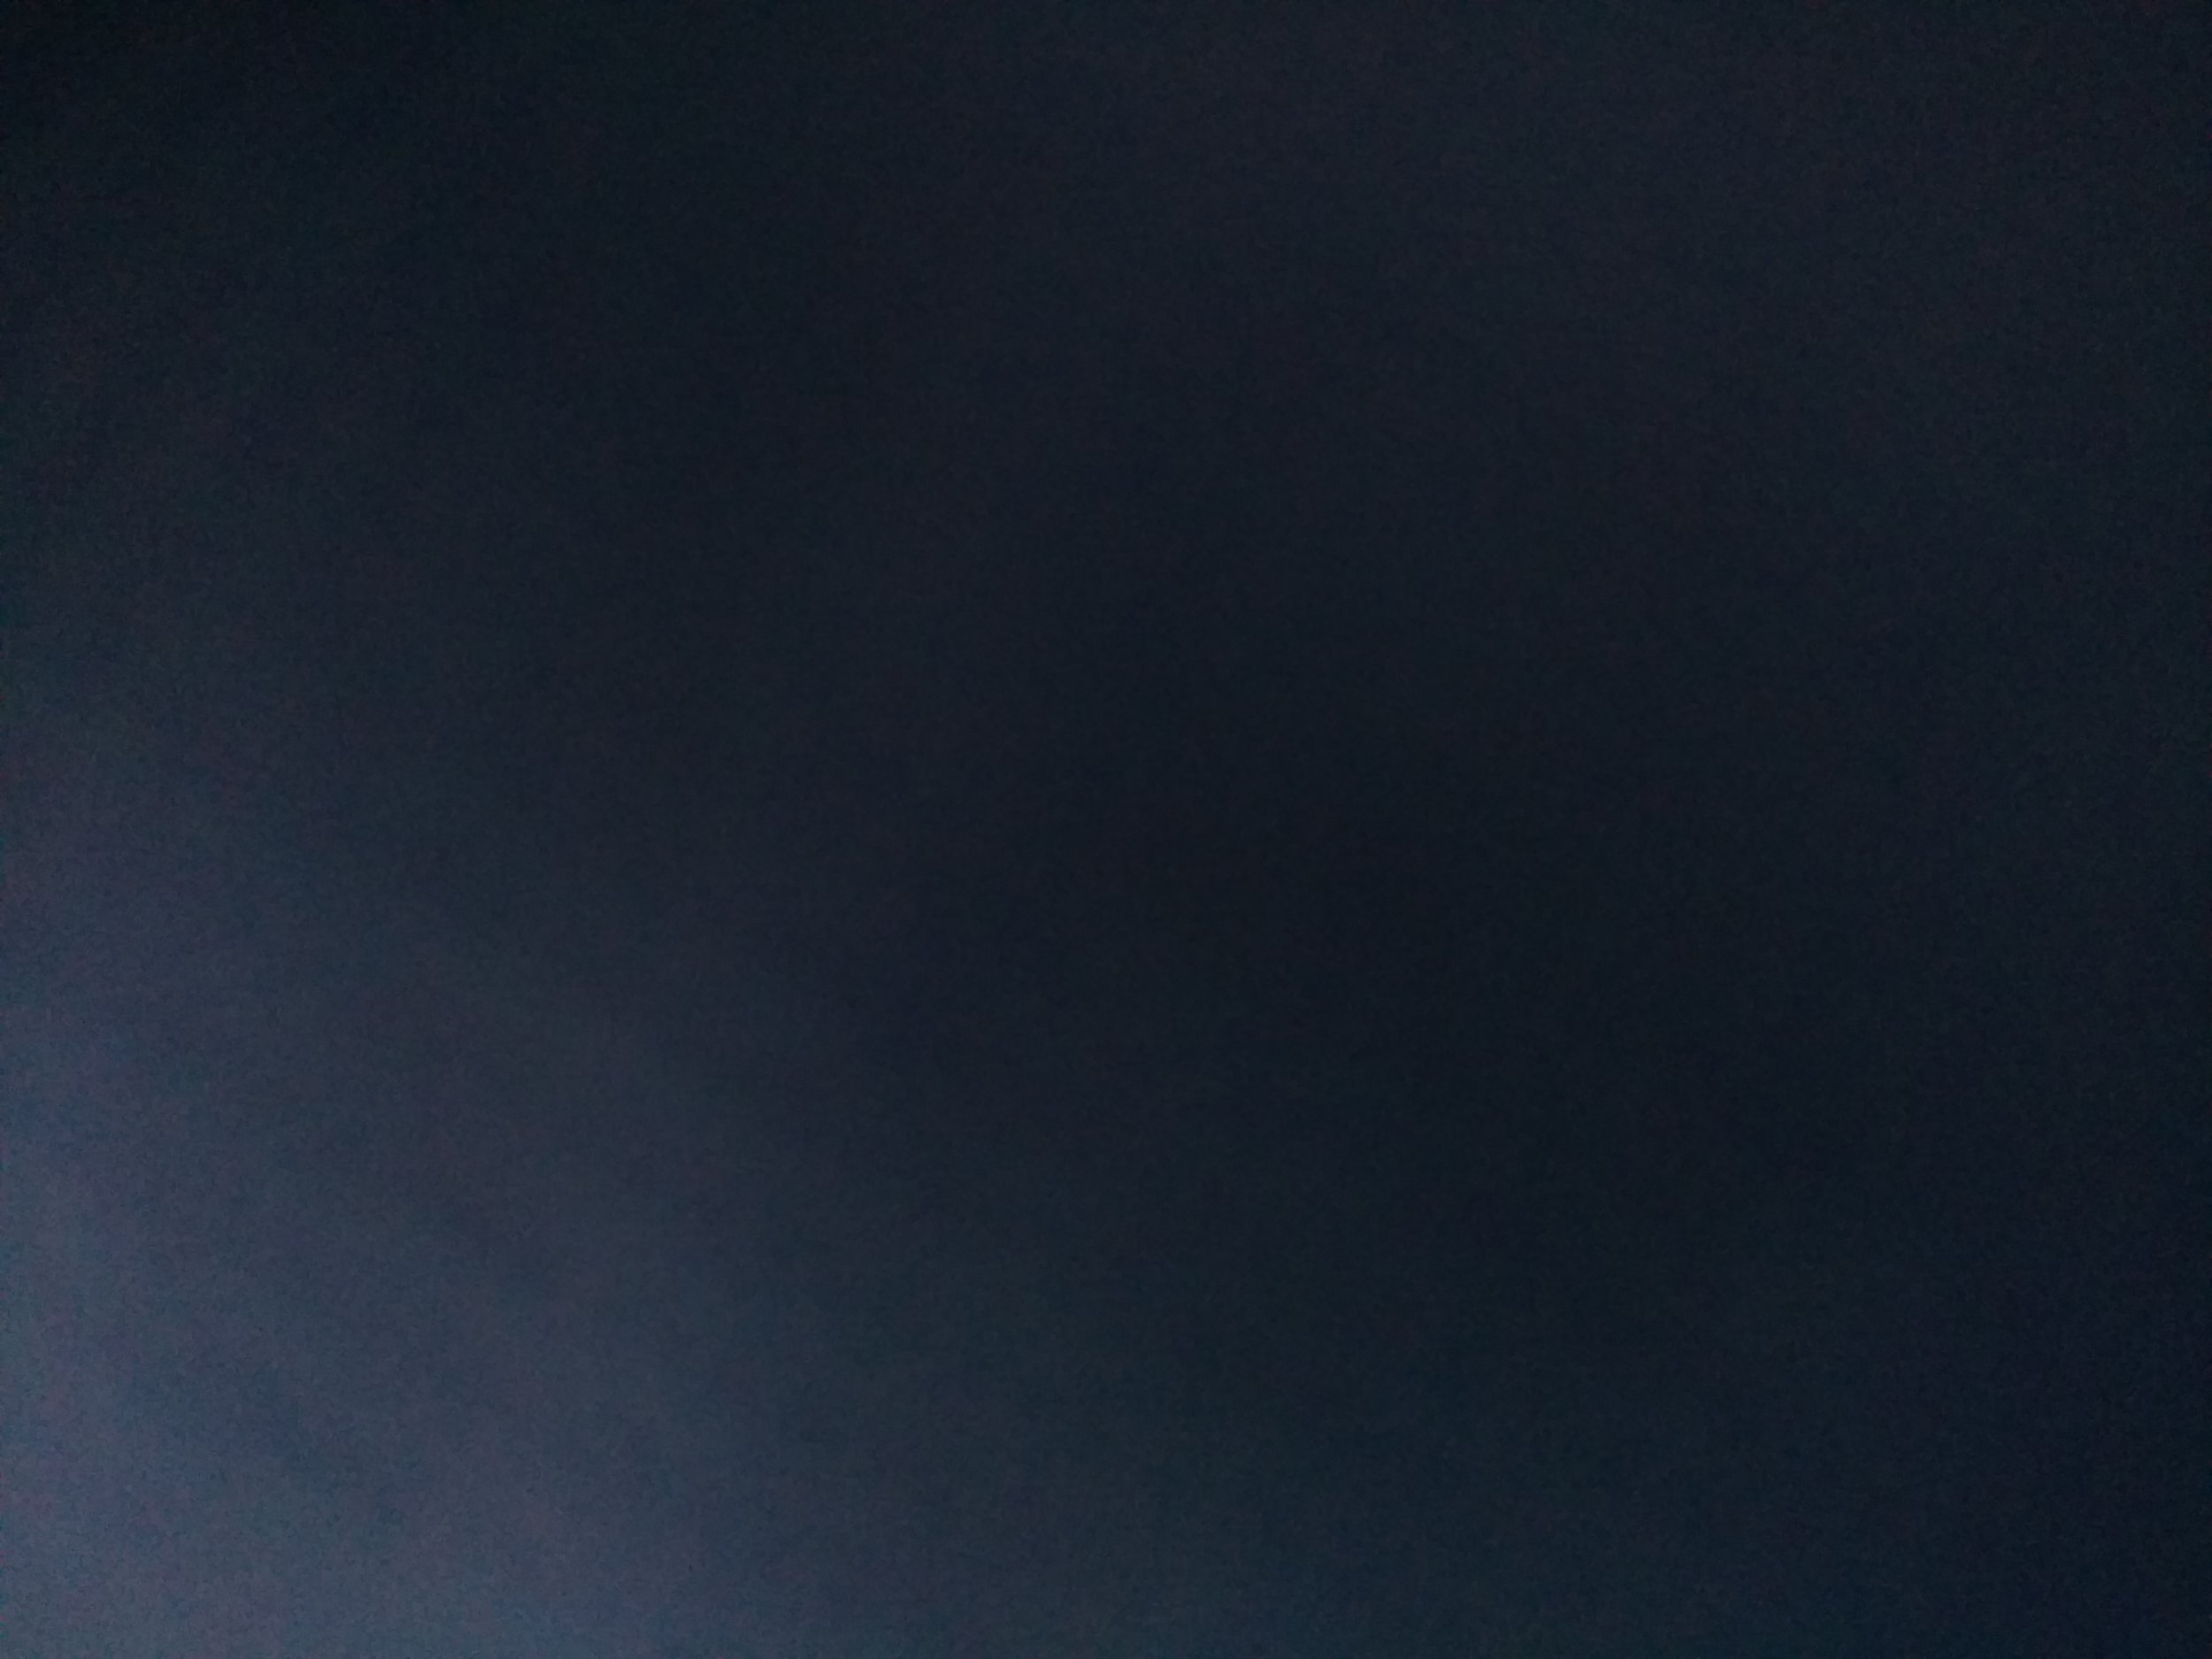 willroth-co-free-texture-gradient-083.jpg